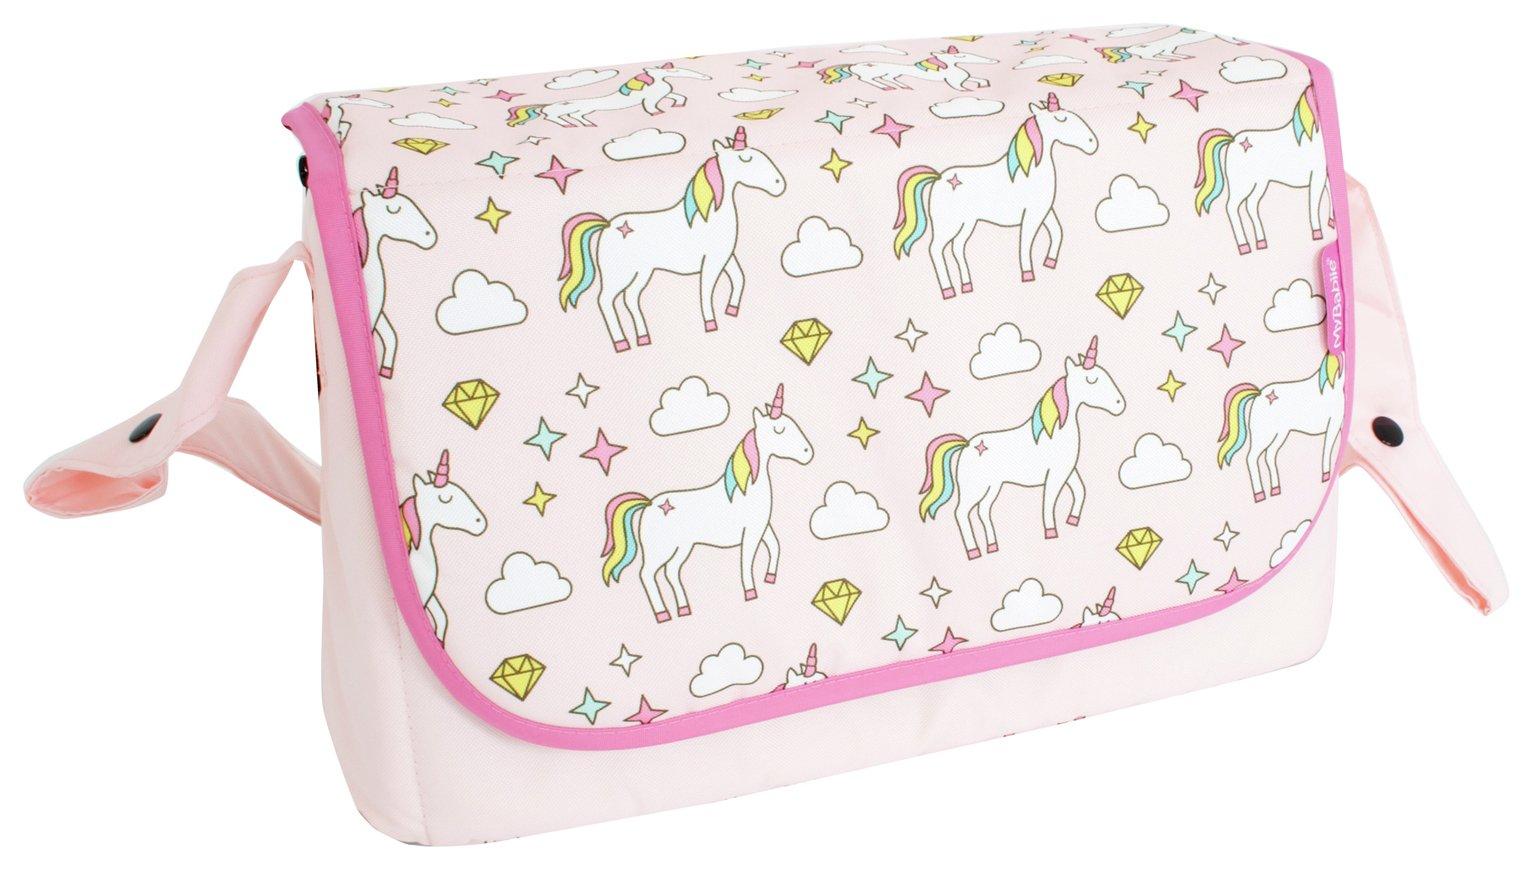 My Babiie Katie Piper Changing Bag - Unicorns